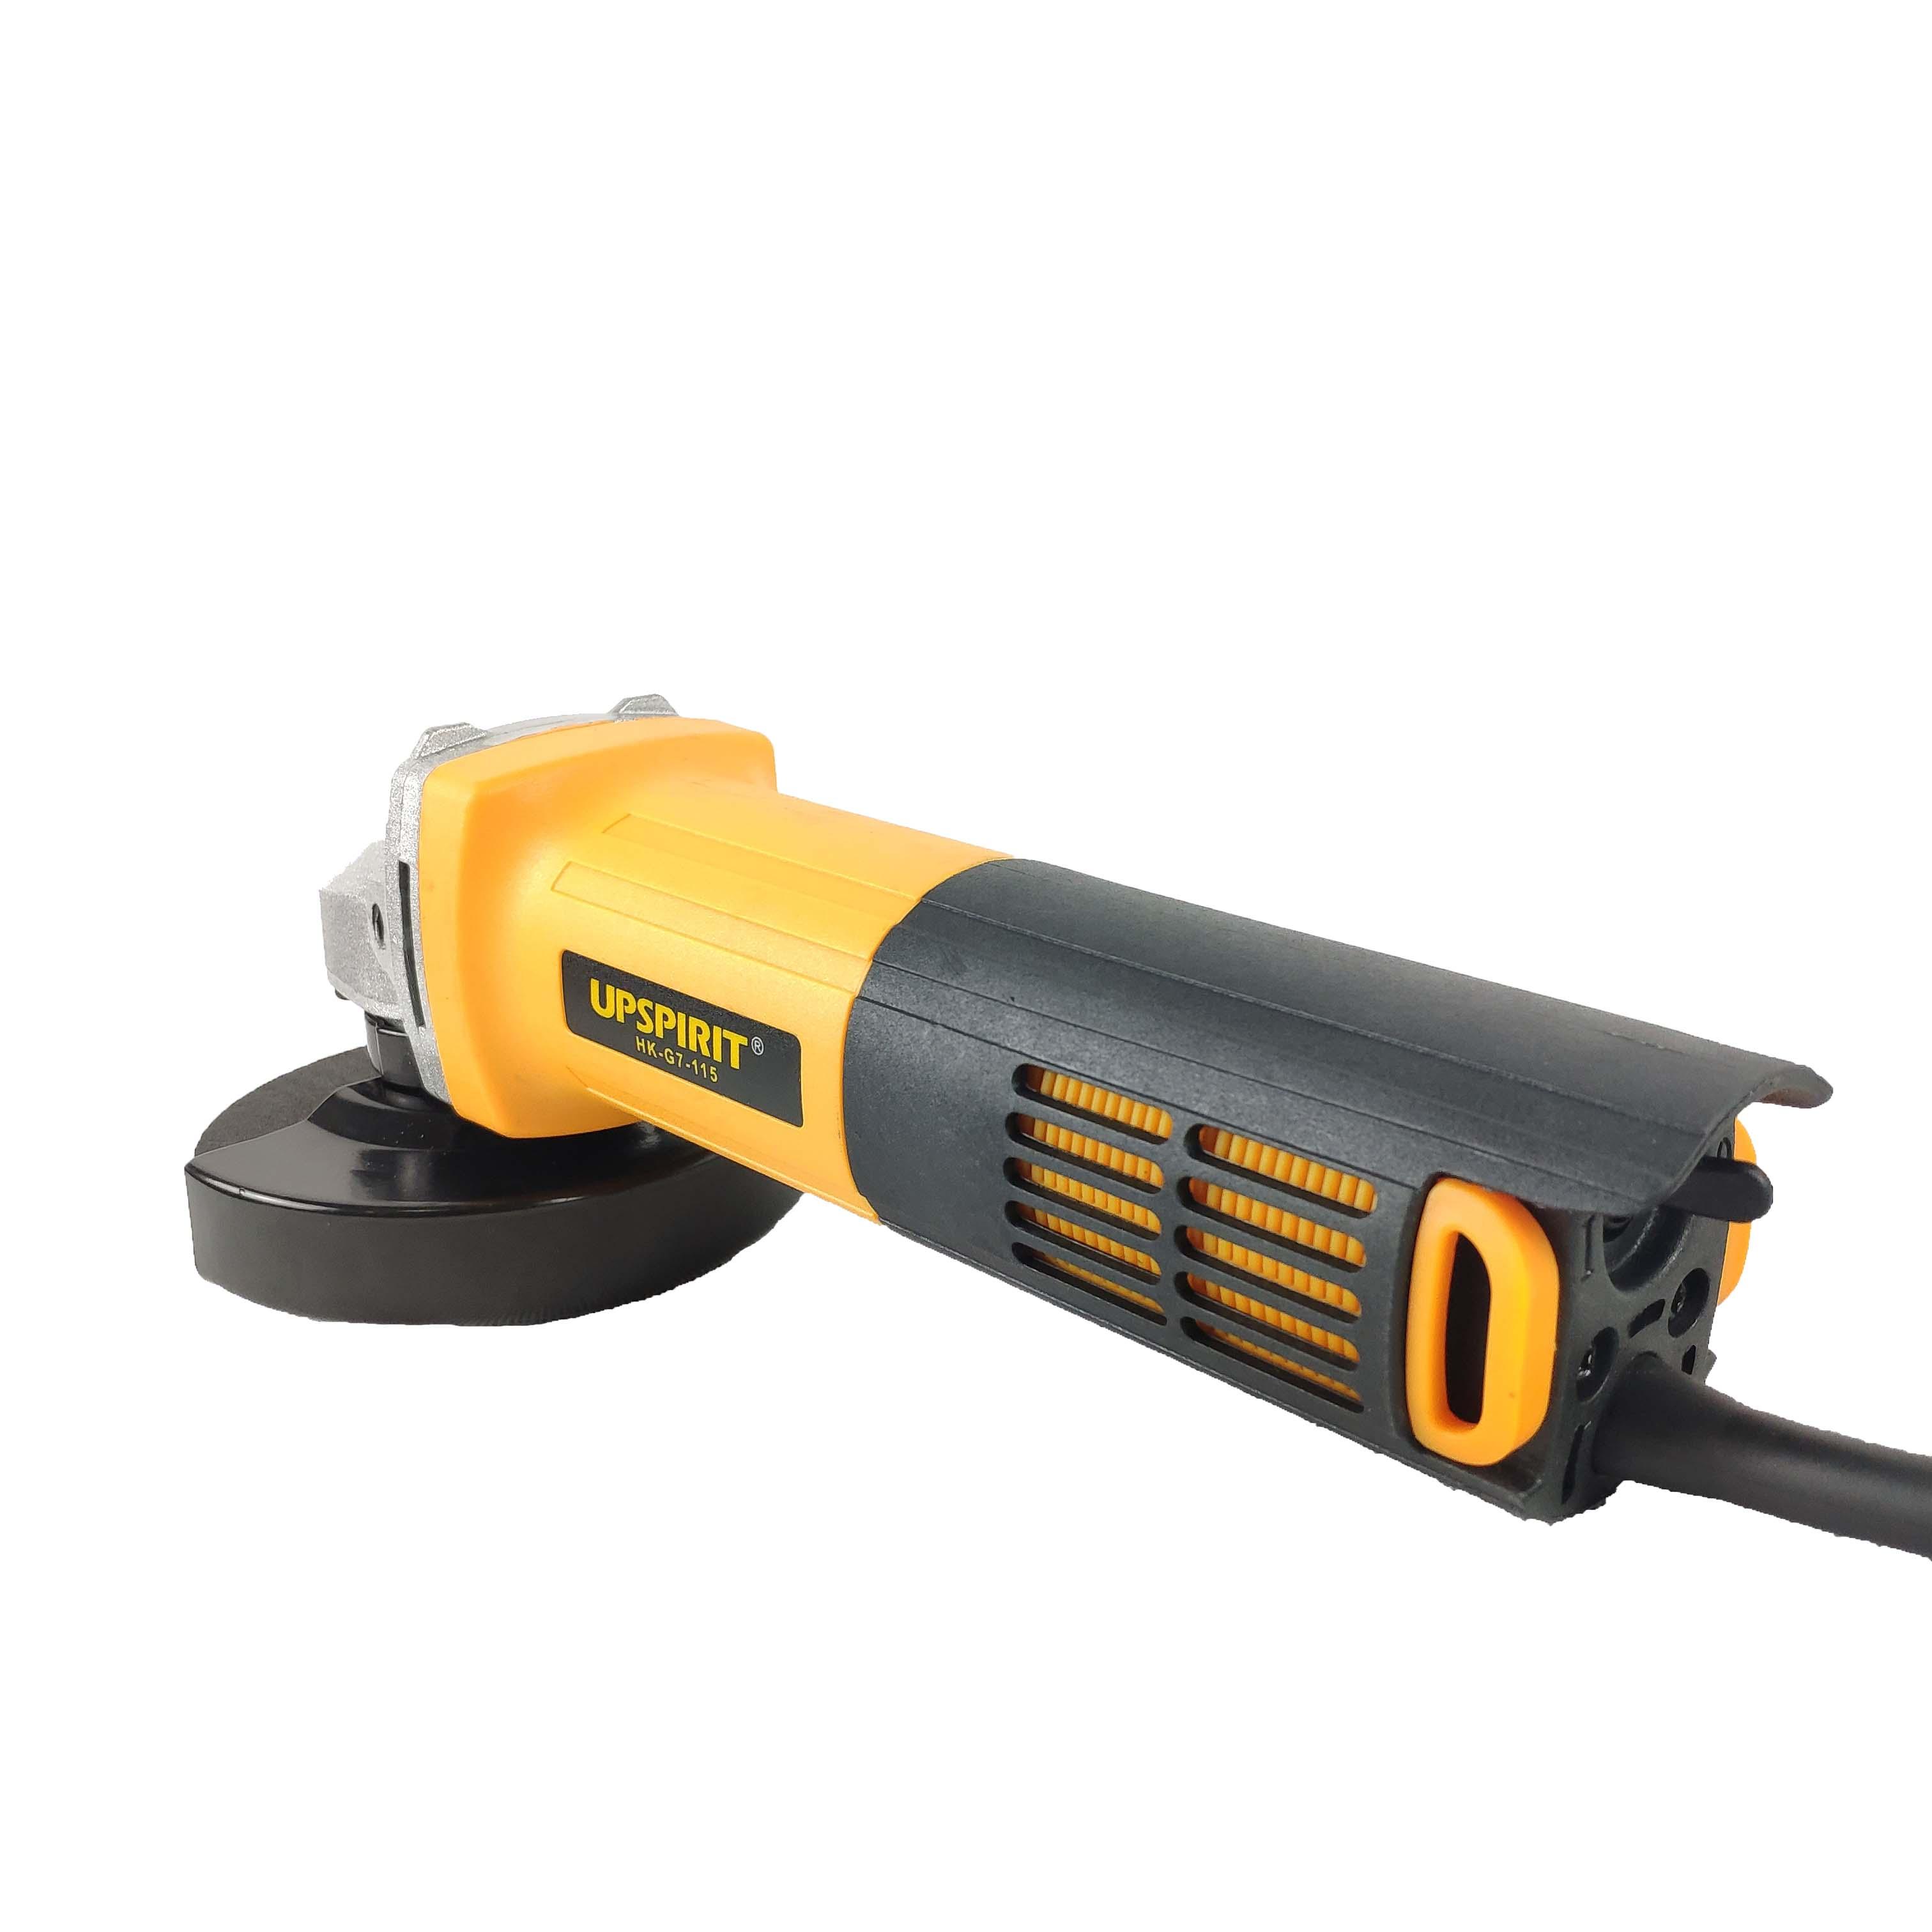 UPSPIRIT good price of 4 inch mini electric angle grinder